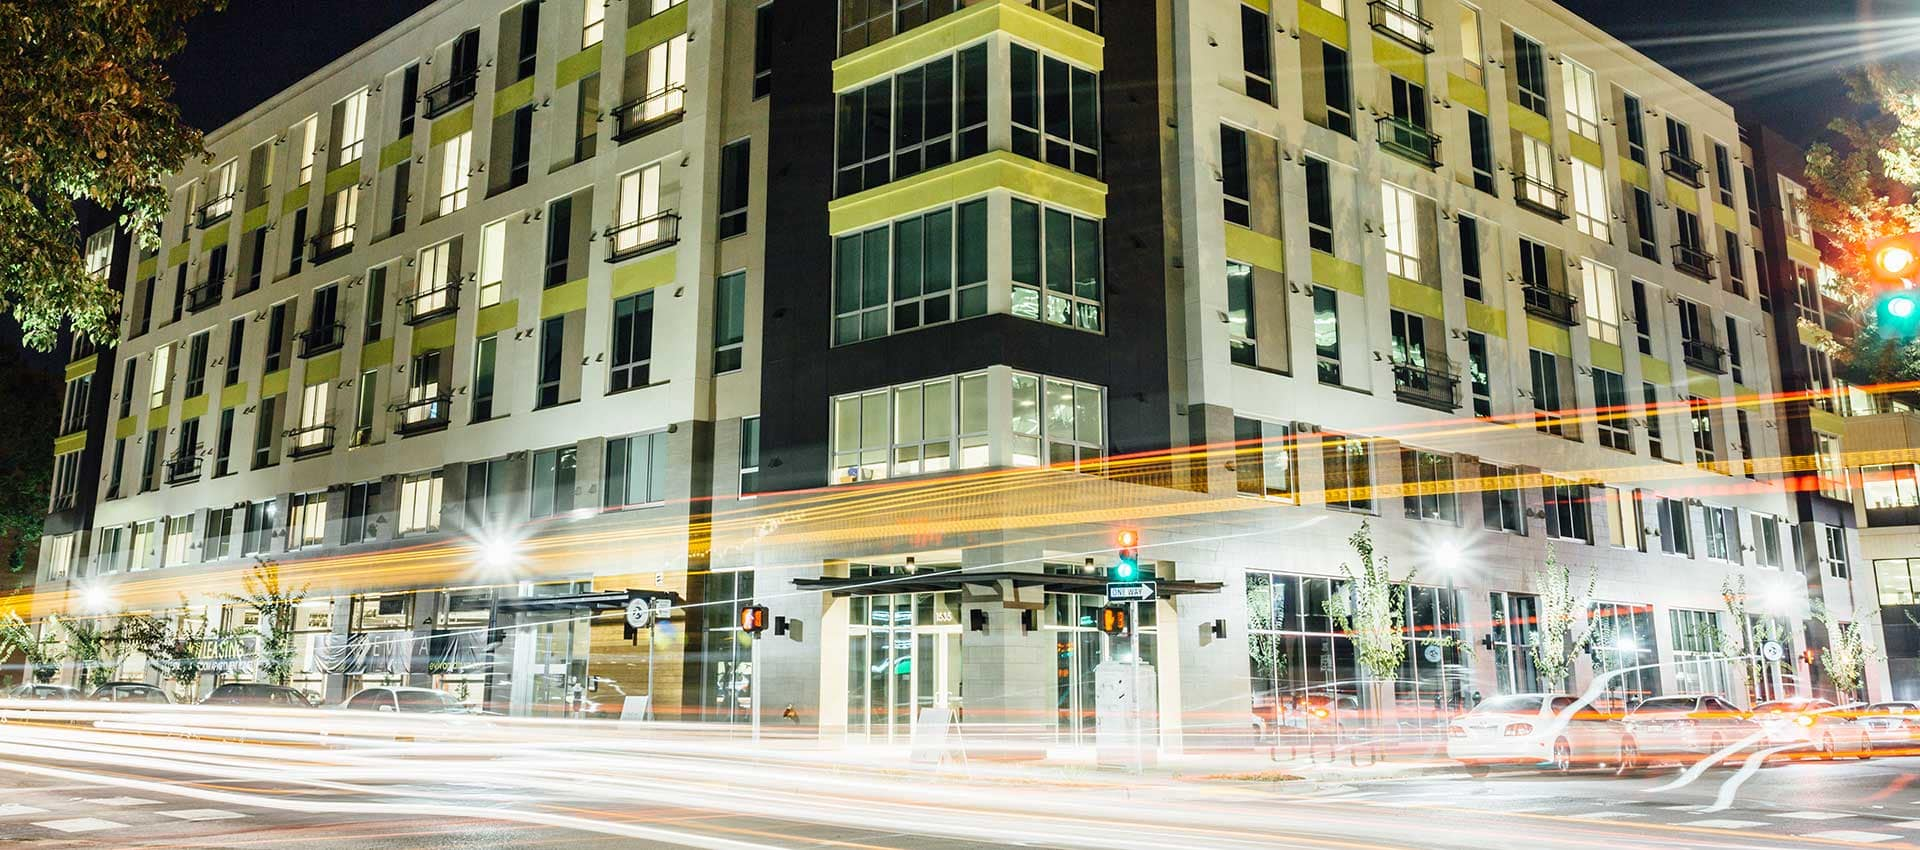 EVIVA Midtown at night